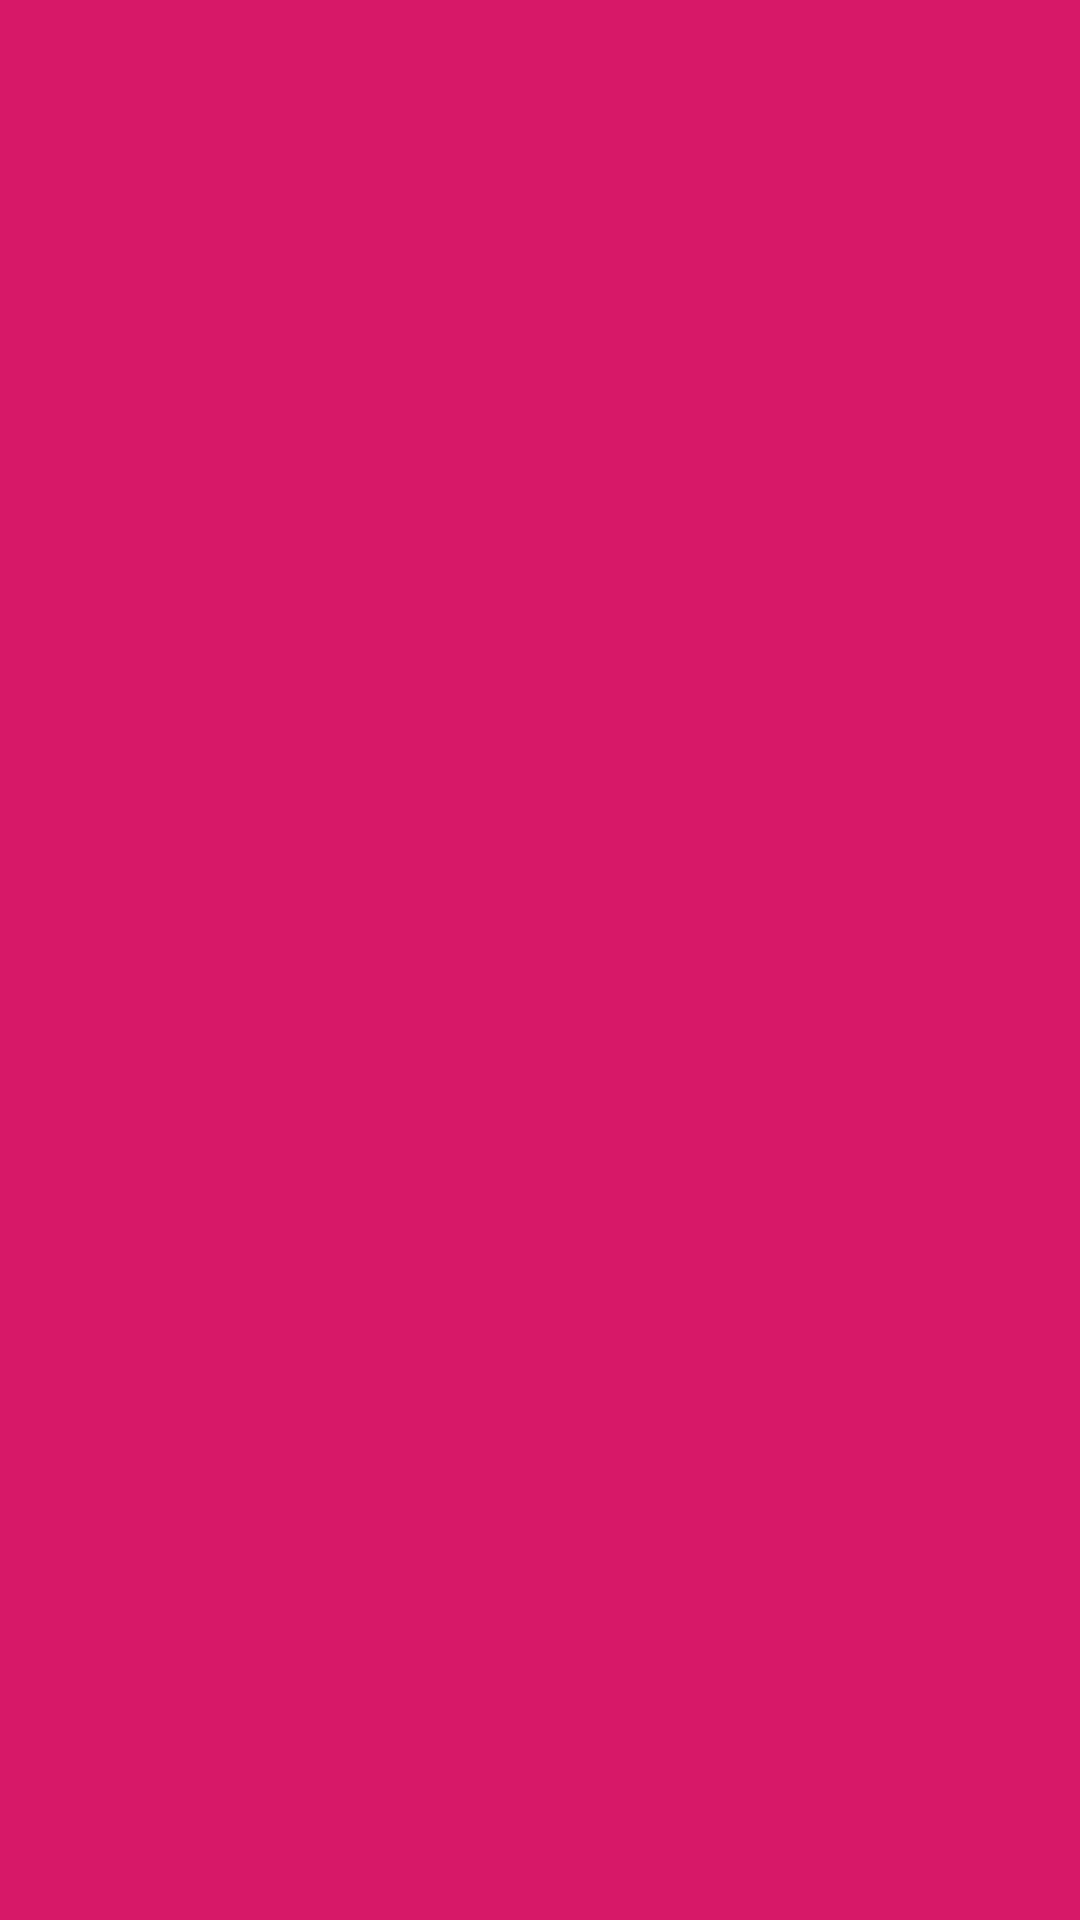 1080x1920 Dogwood Rose Solid Color Background